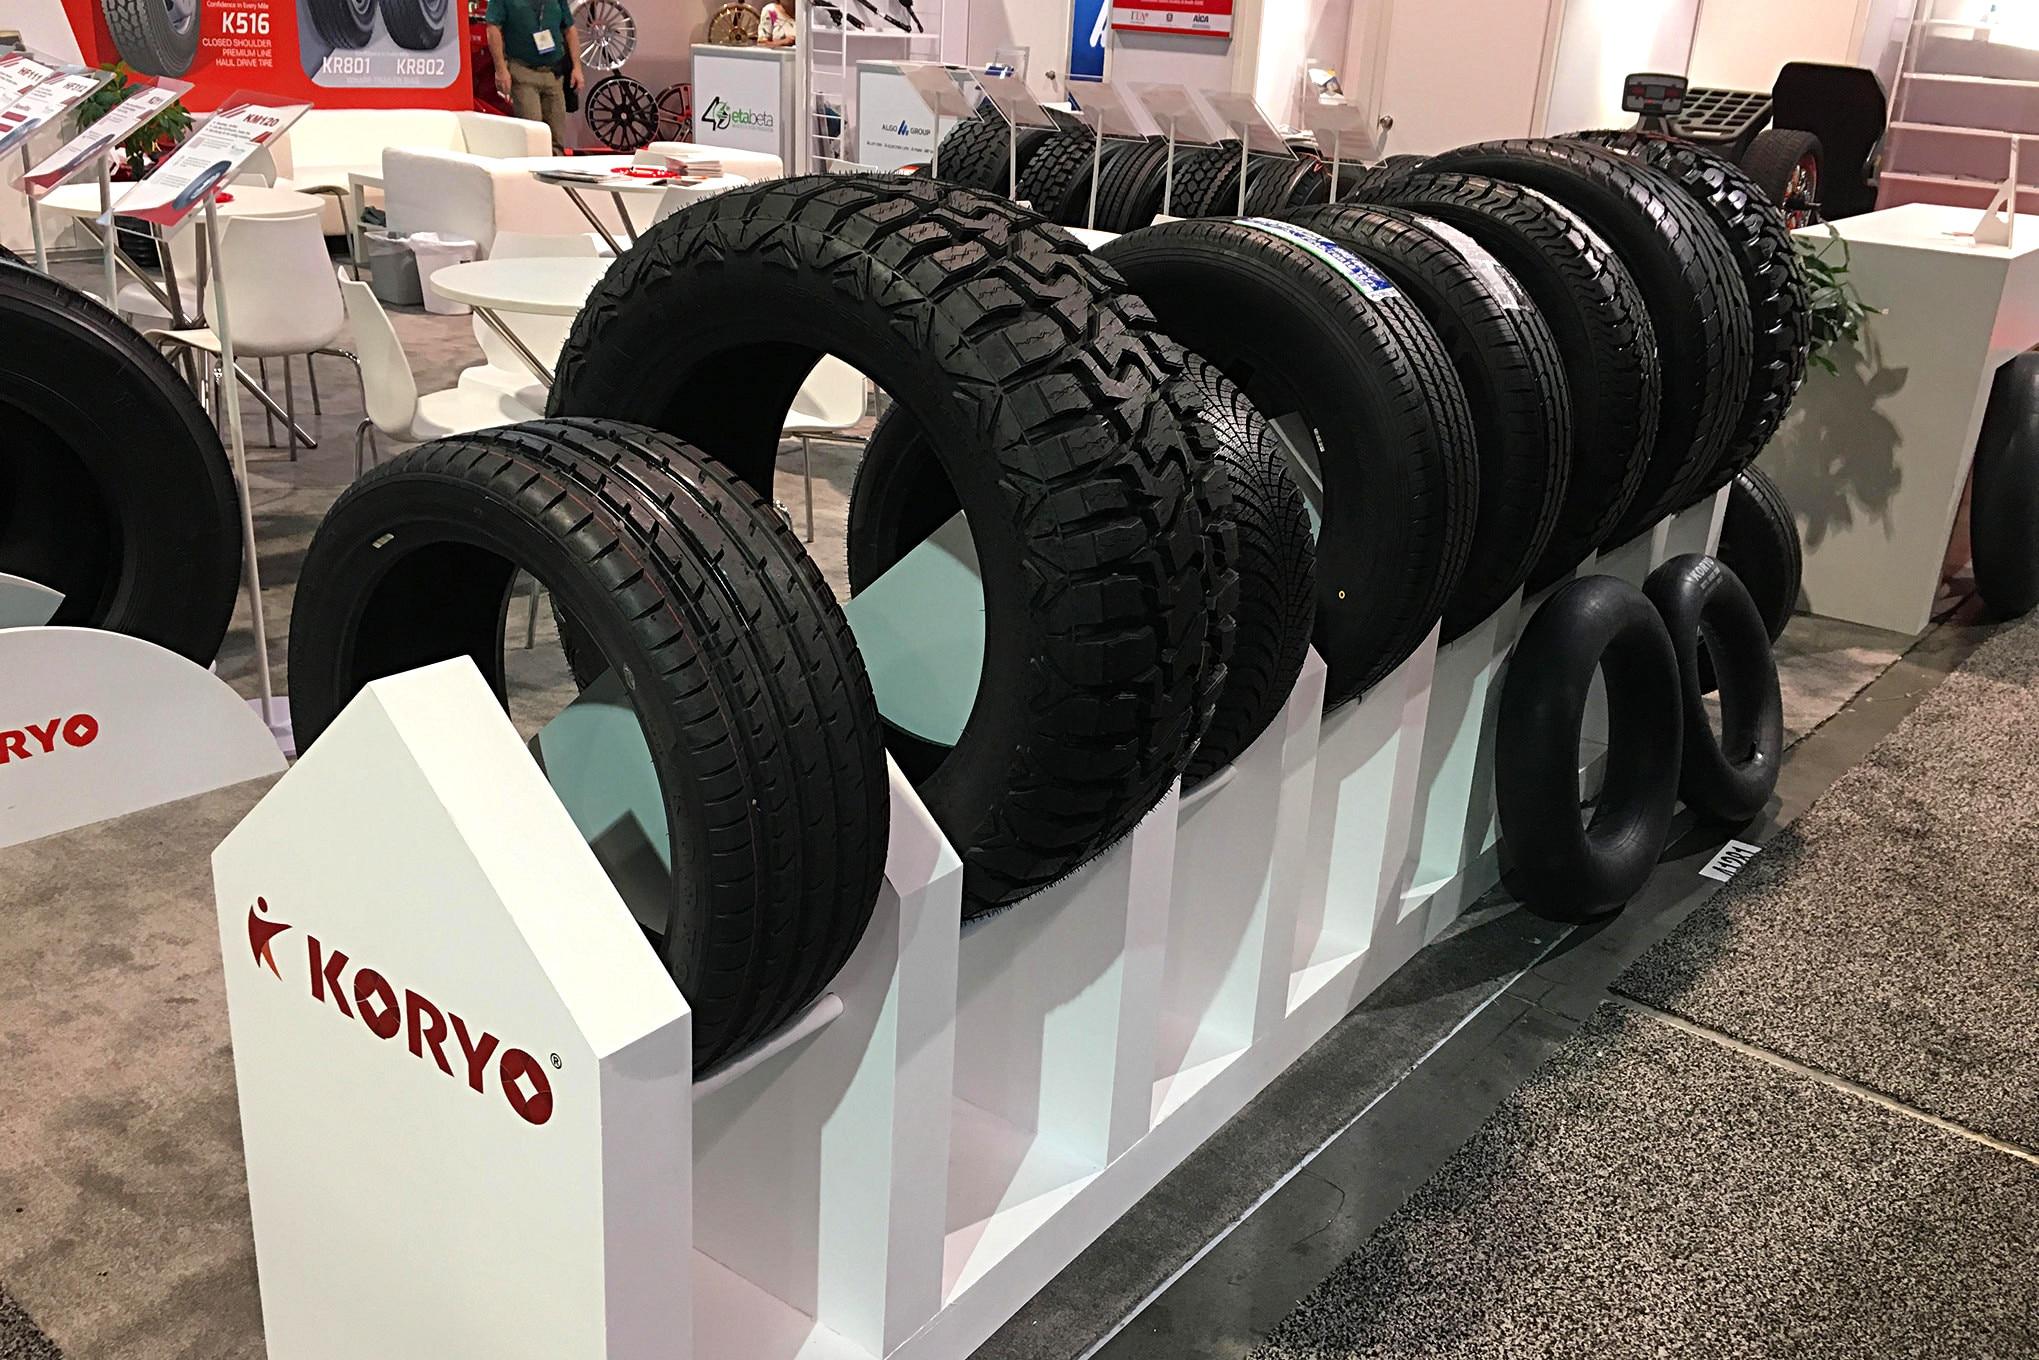 sema off brand off road tires 13